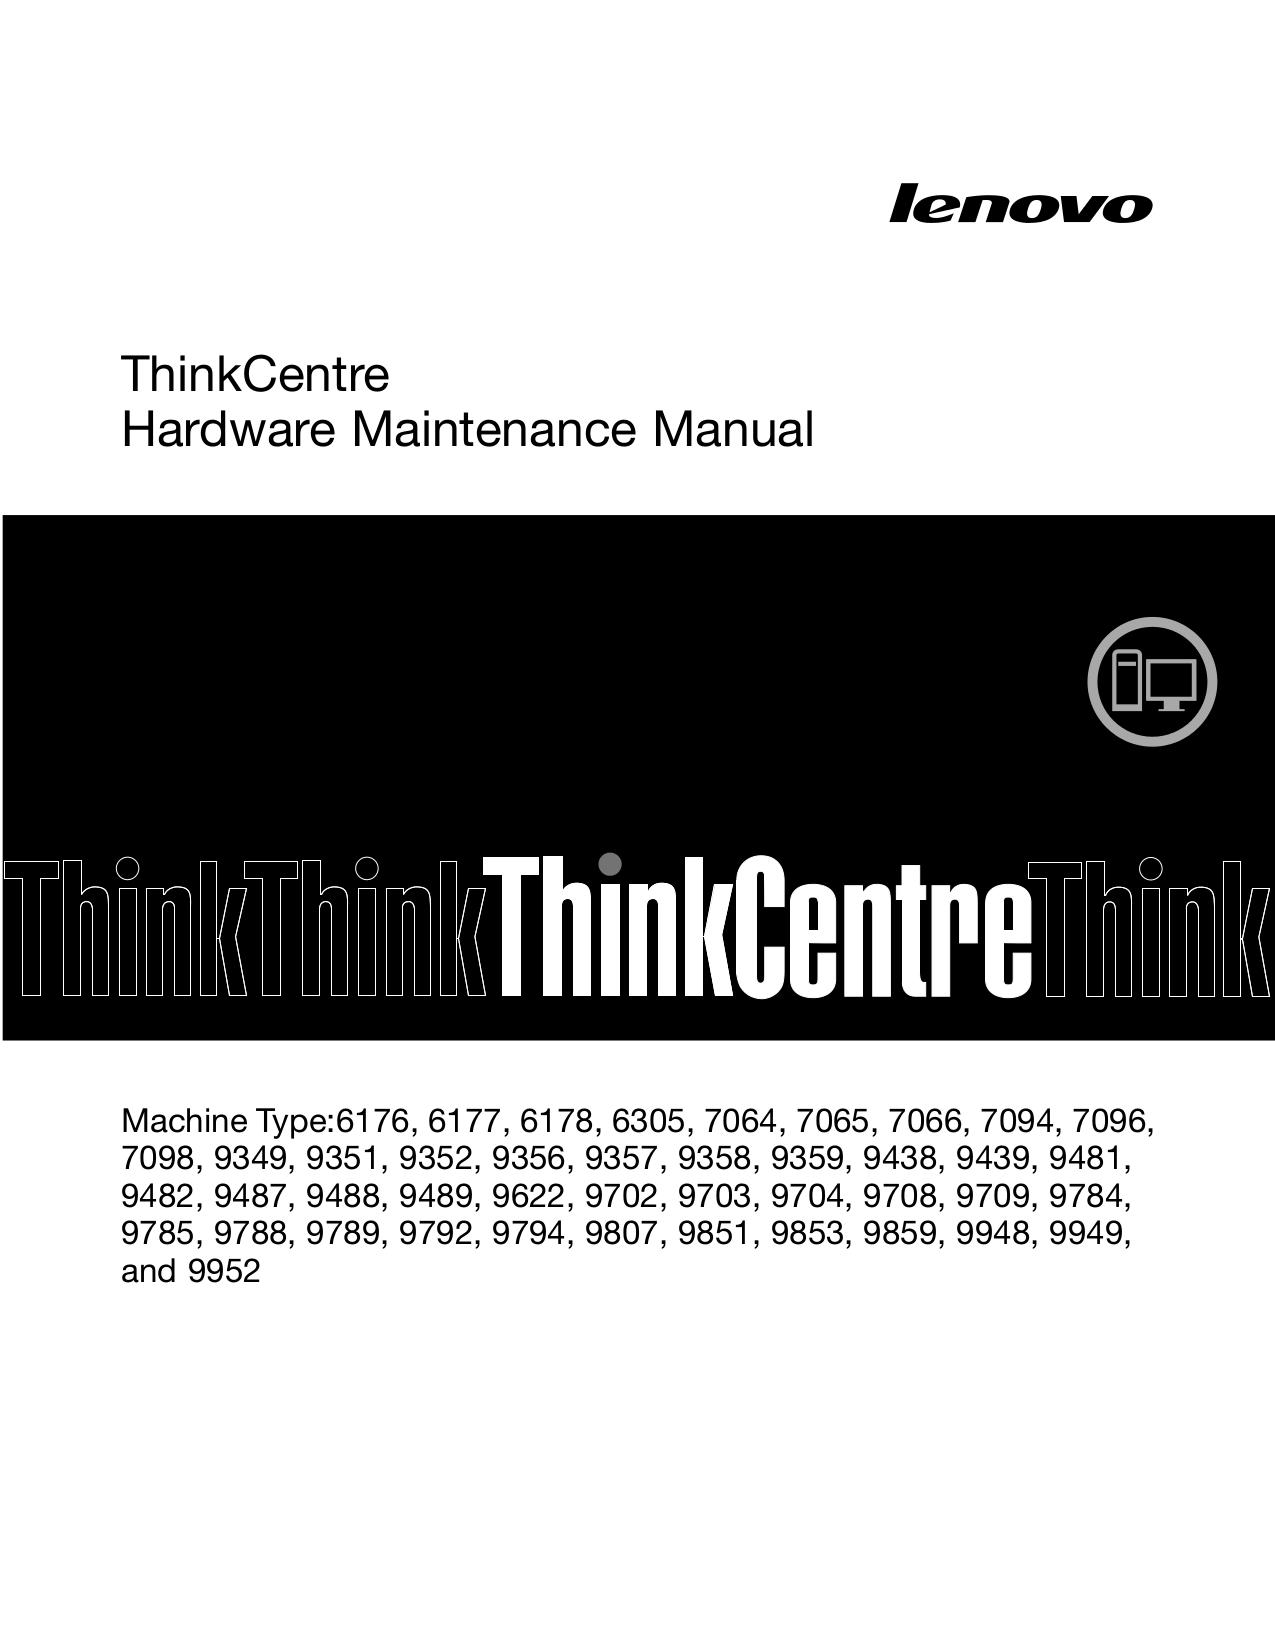 pdf for Lenovo Desktop ThinkCentre M57e 9622 manual